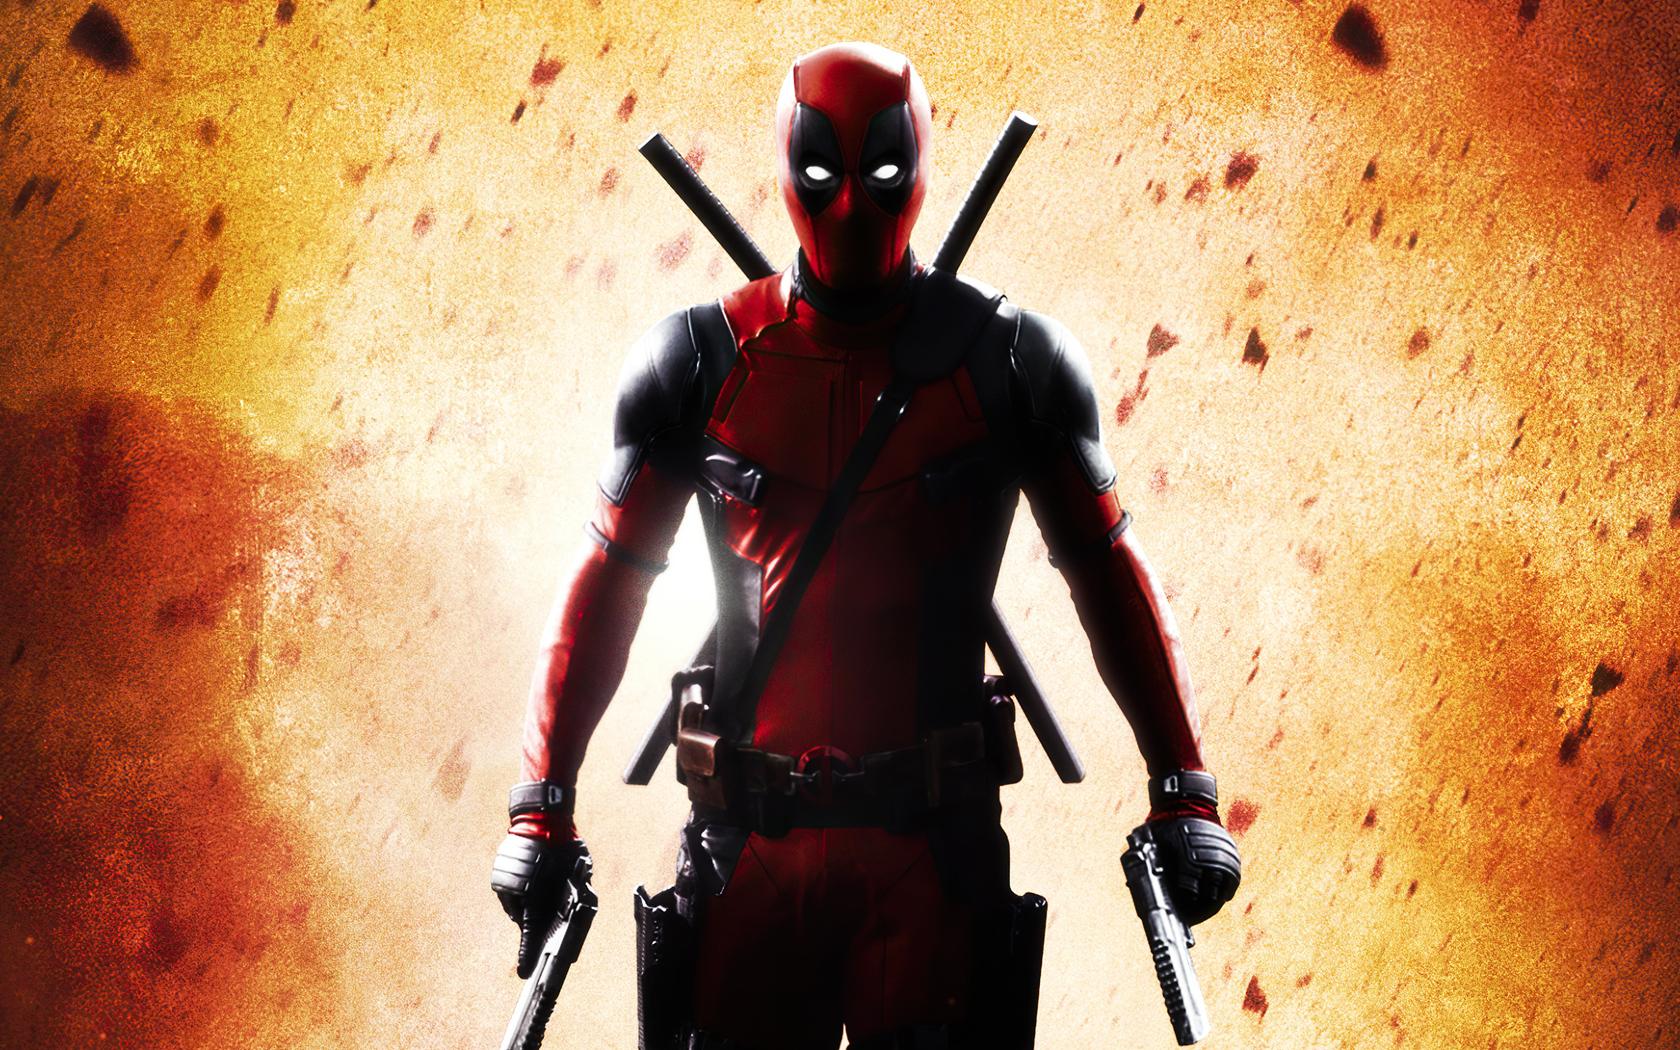 deadpool-superhero-4k-wn.jpg